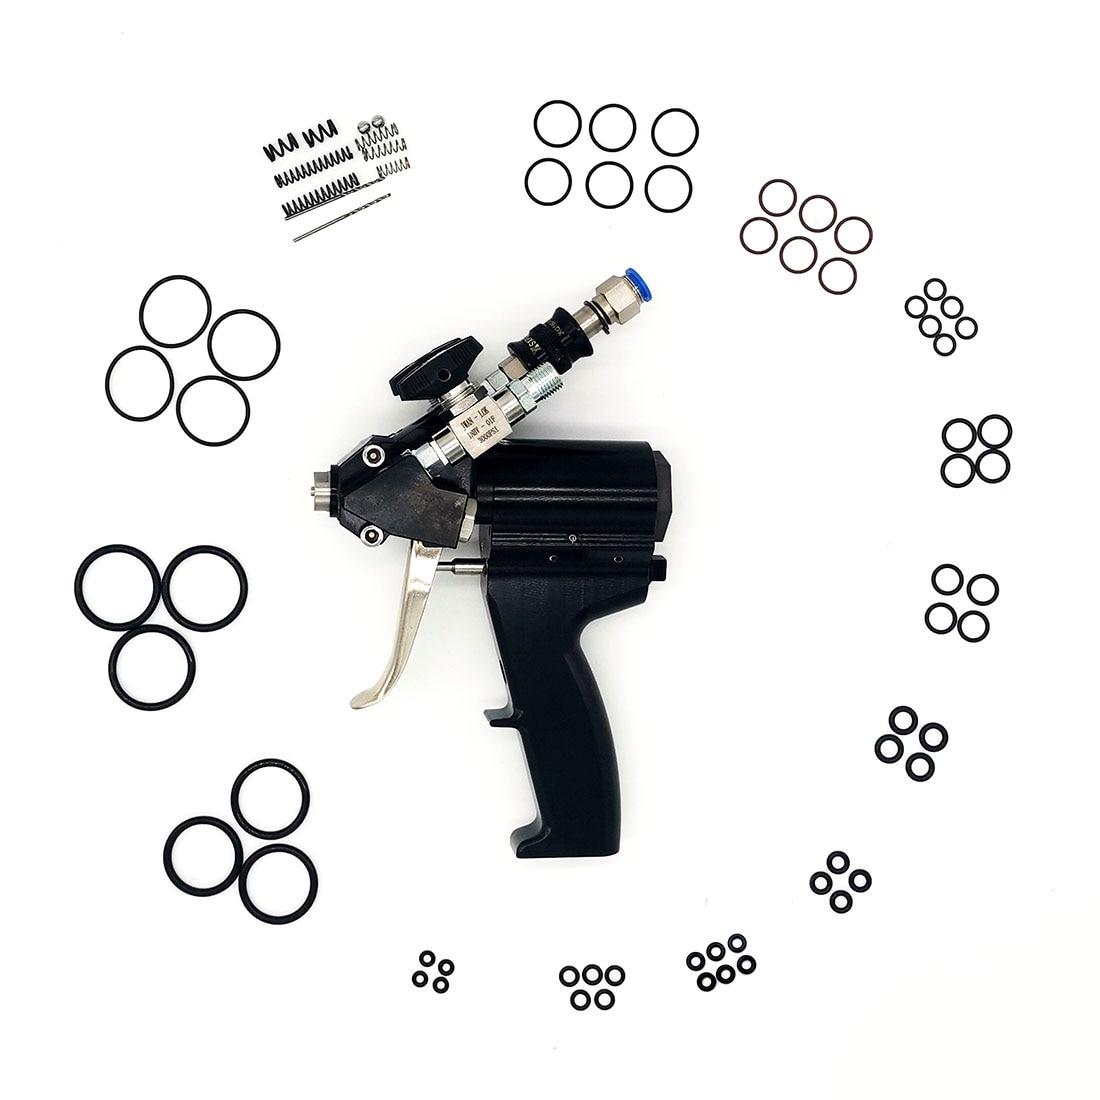 P2 PU مسدس رش للرغاوي البولي يوريثين تطهير الهواء بندقية رش التنظيف الذاتي مع مجموعة الملحقات